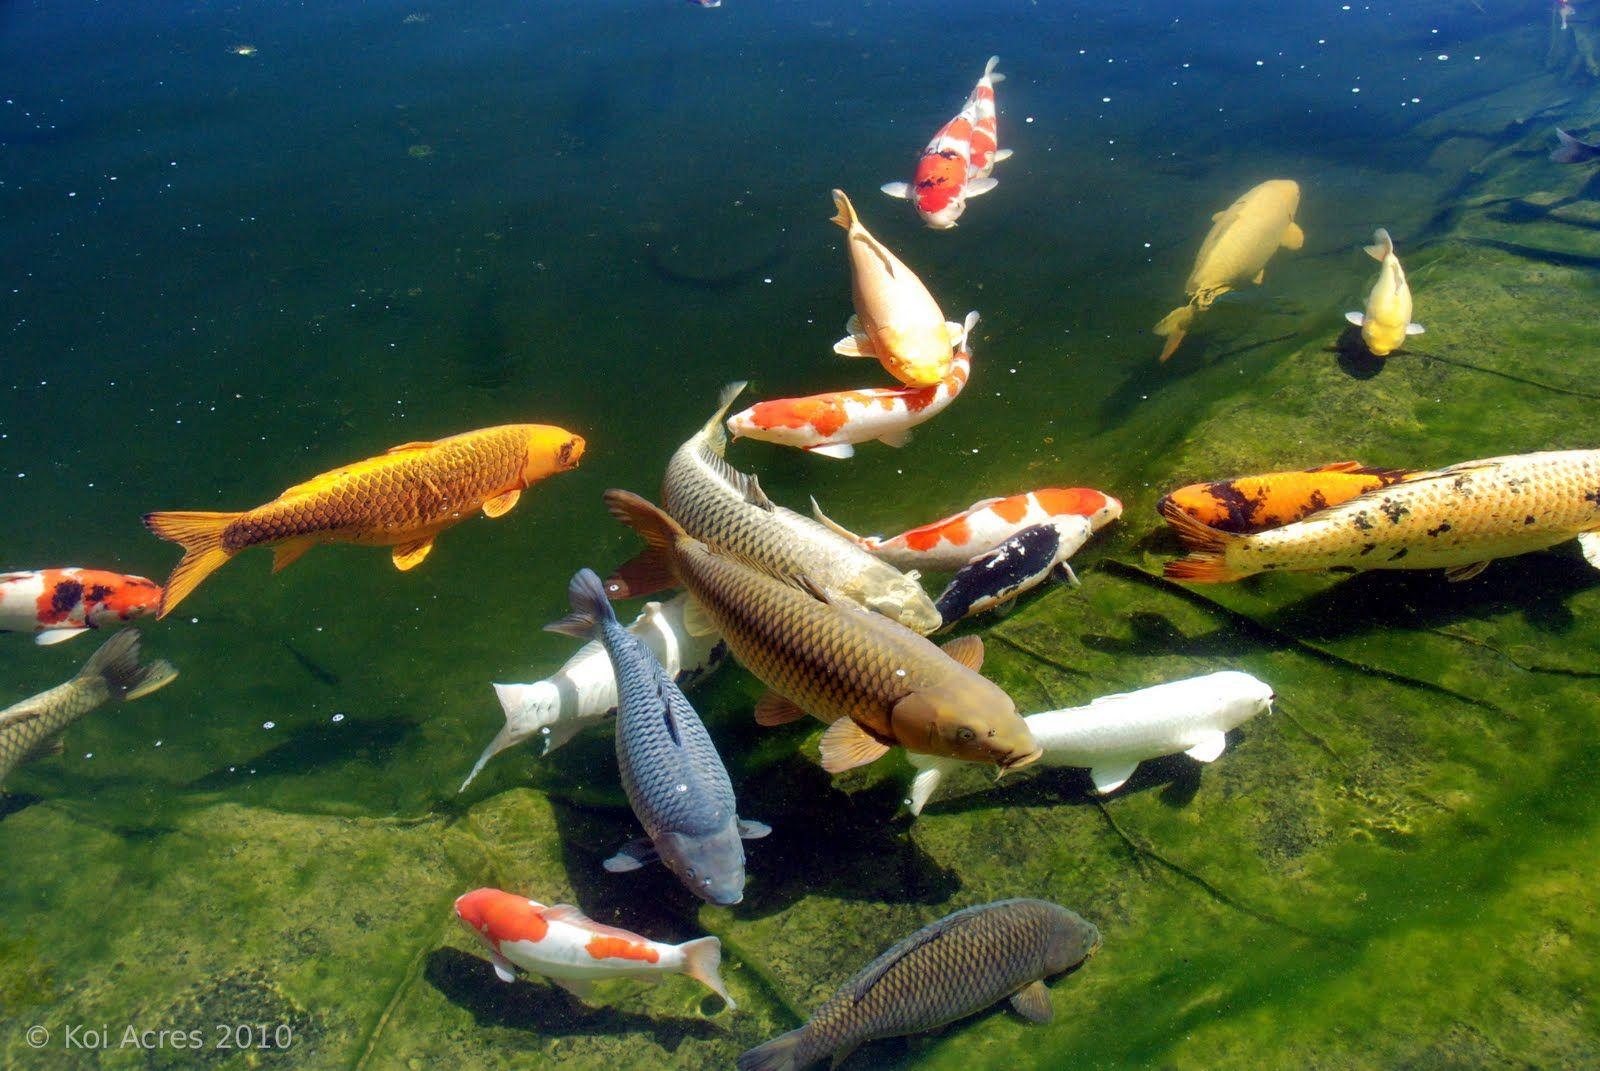 BIG koi, and beautiful patterns and colors. | Koi and Goldfish ...